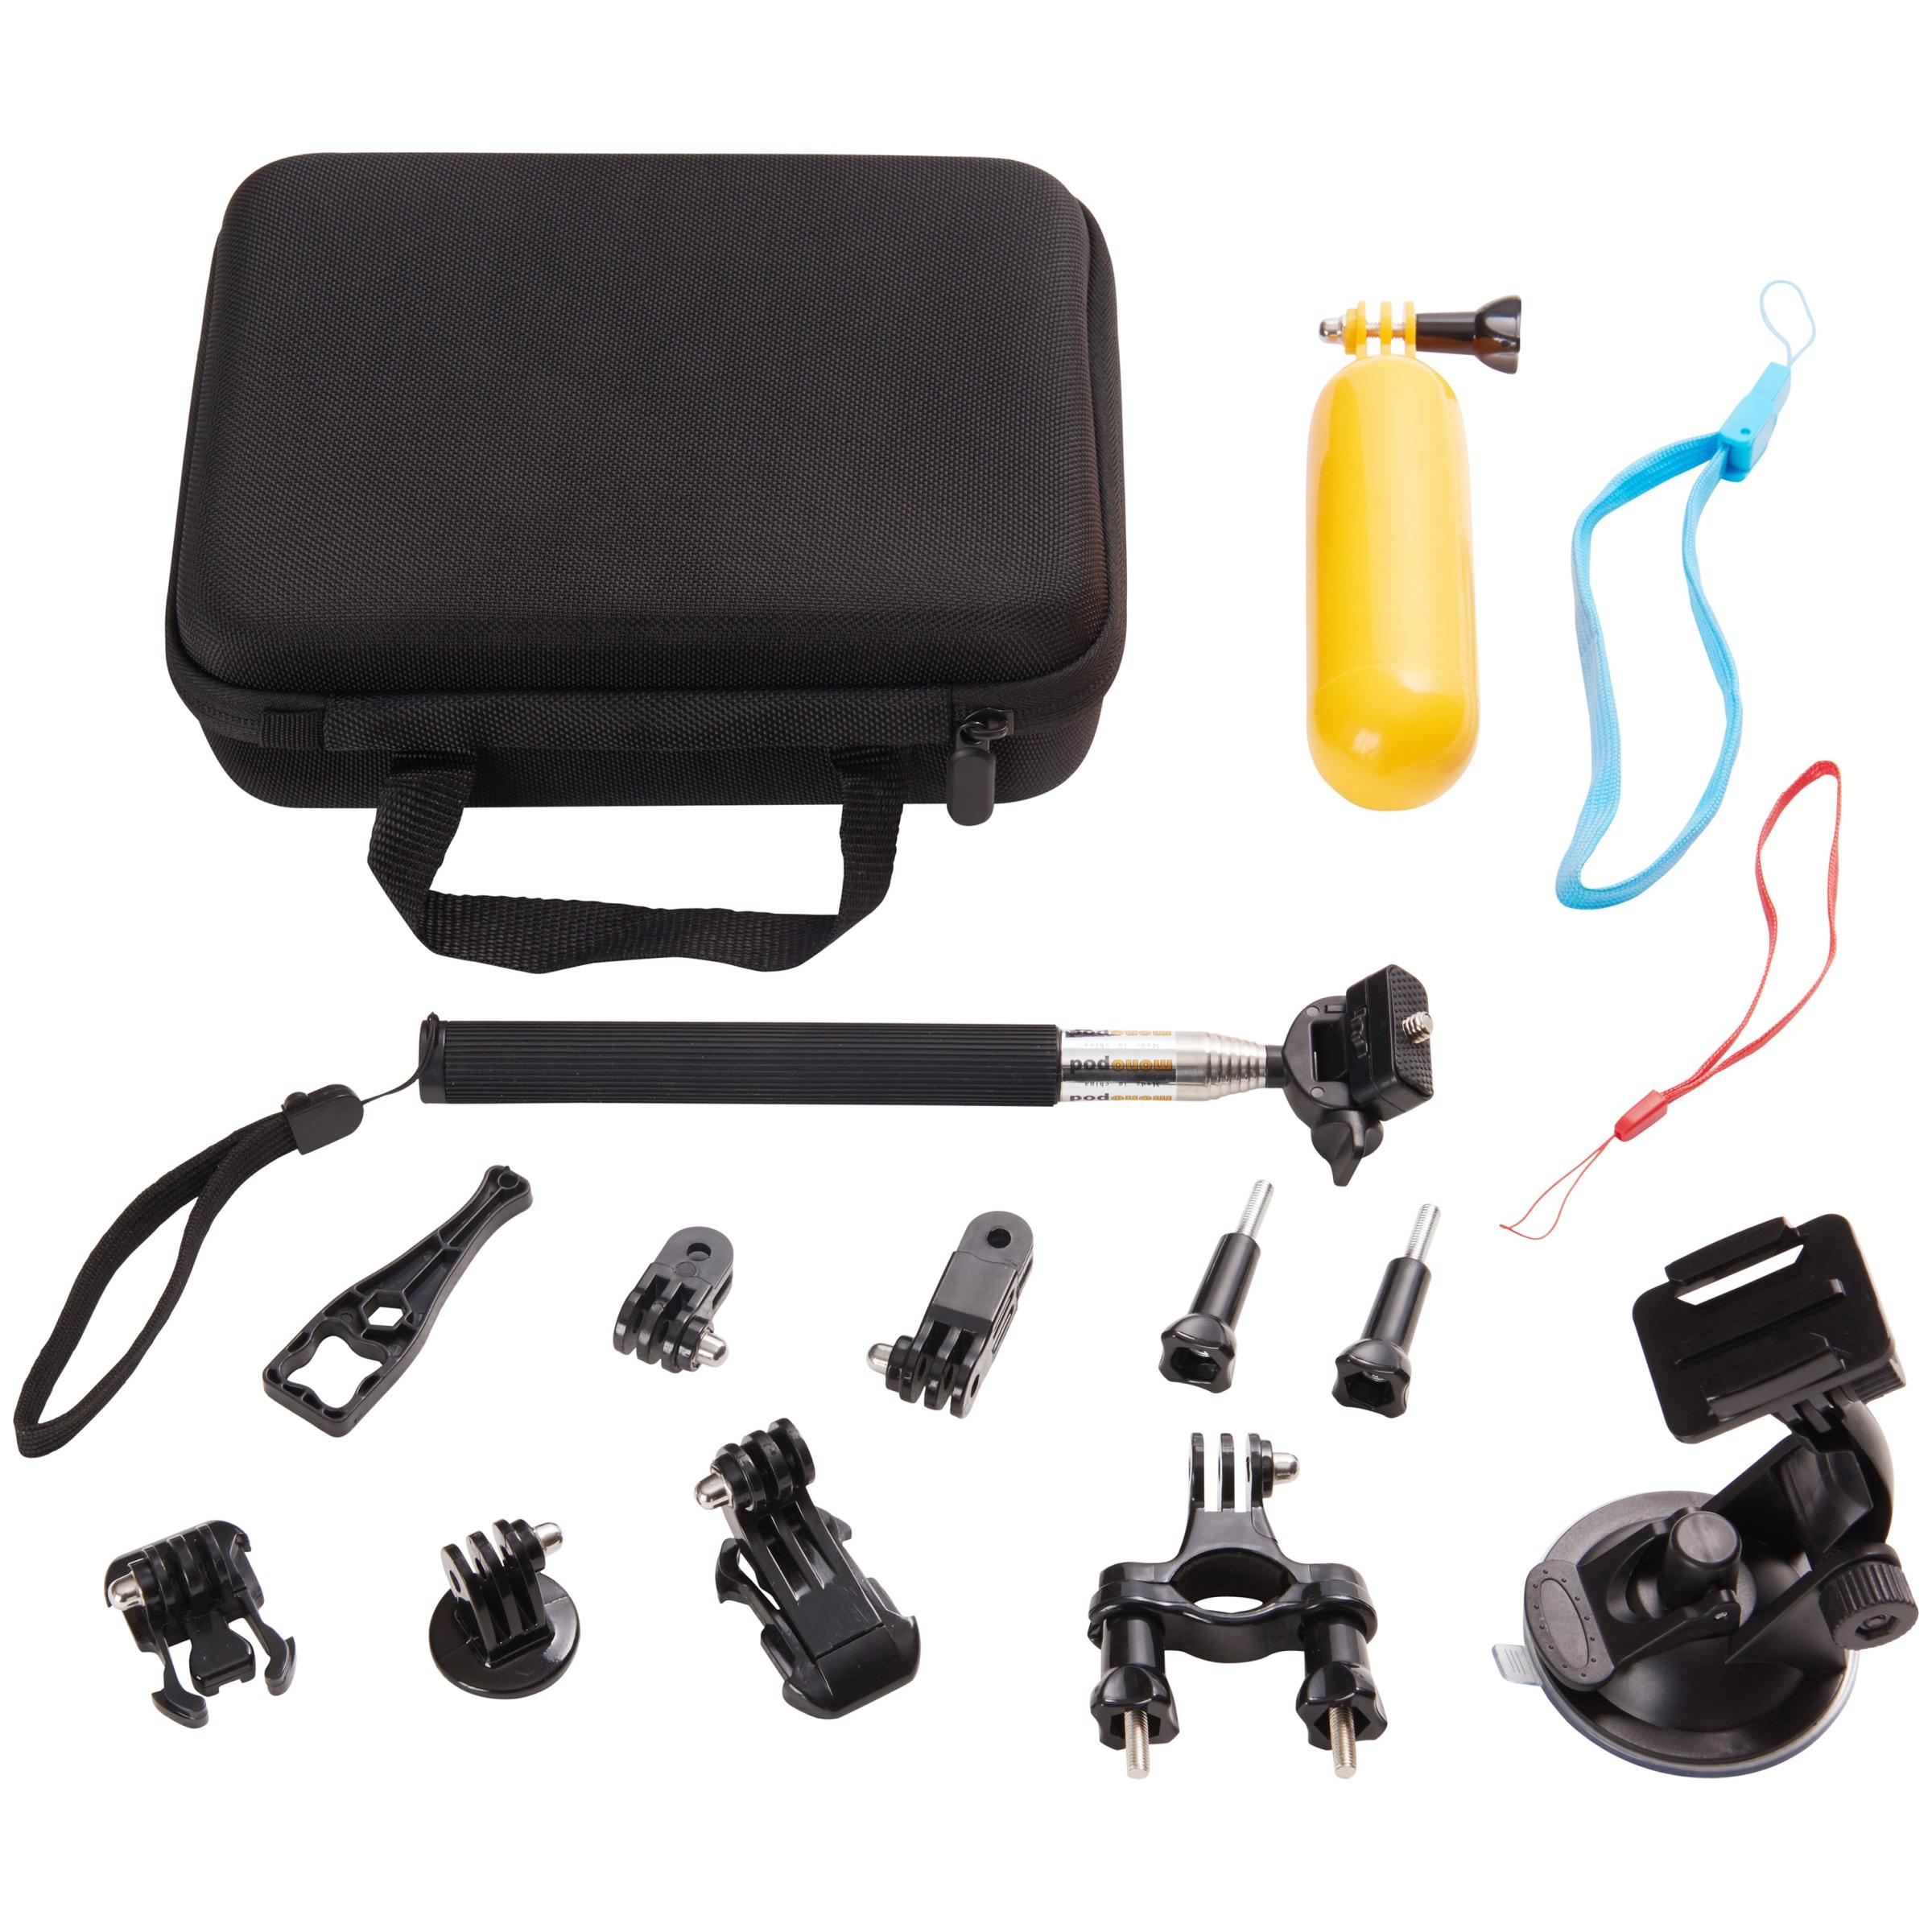 Onn 16-Piece Action Camera Accessory Kit